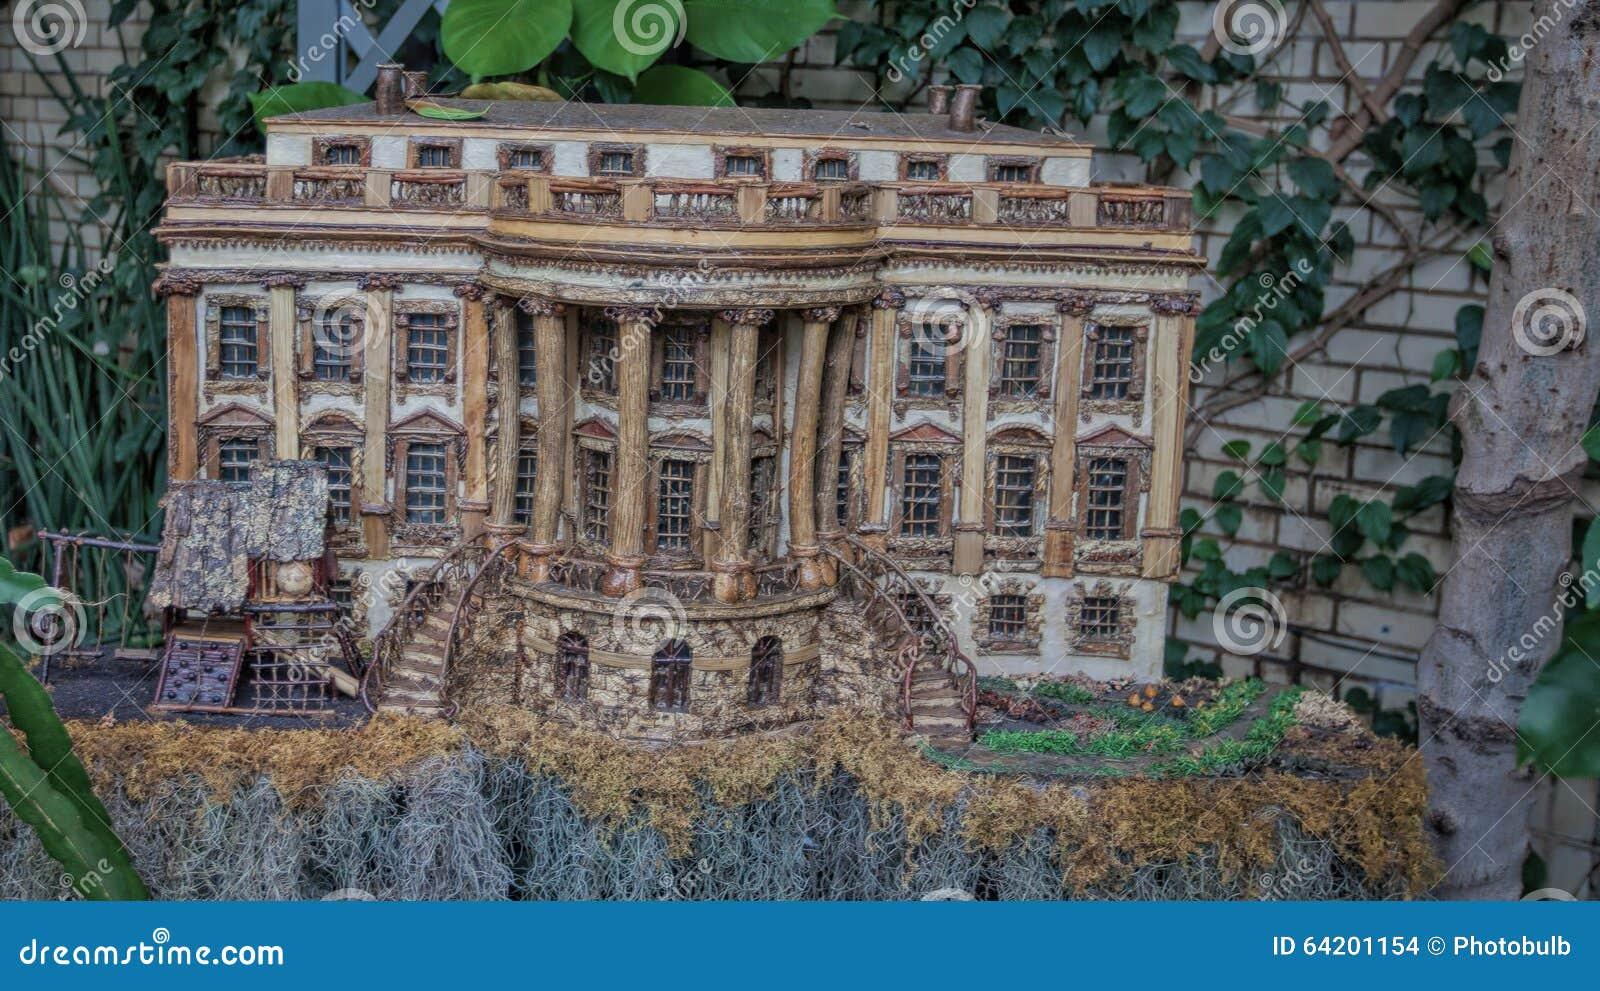 Modelo de la Casa Blanca hecha del material vegetal